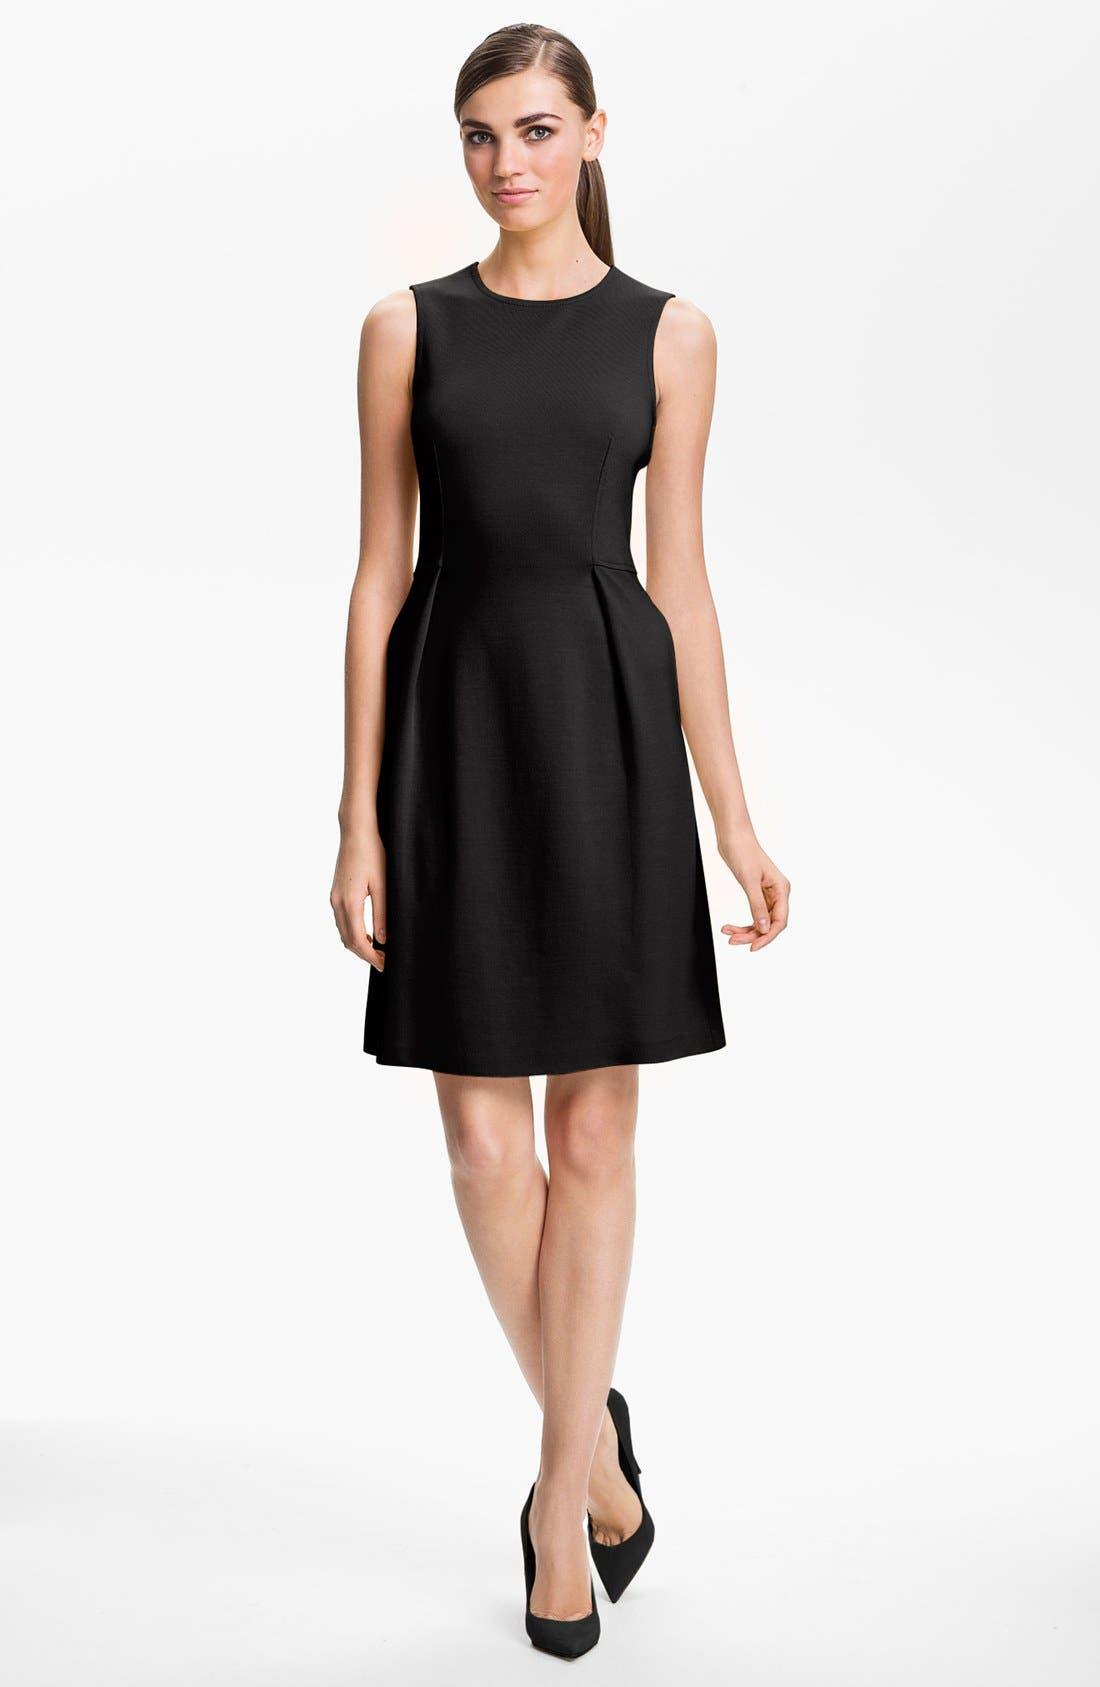 Main Image - St. John Collection Sleeveless Milano Knit Dress